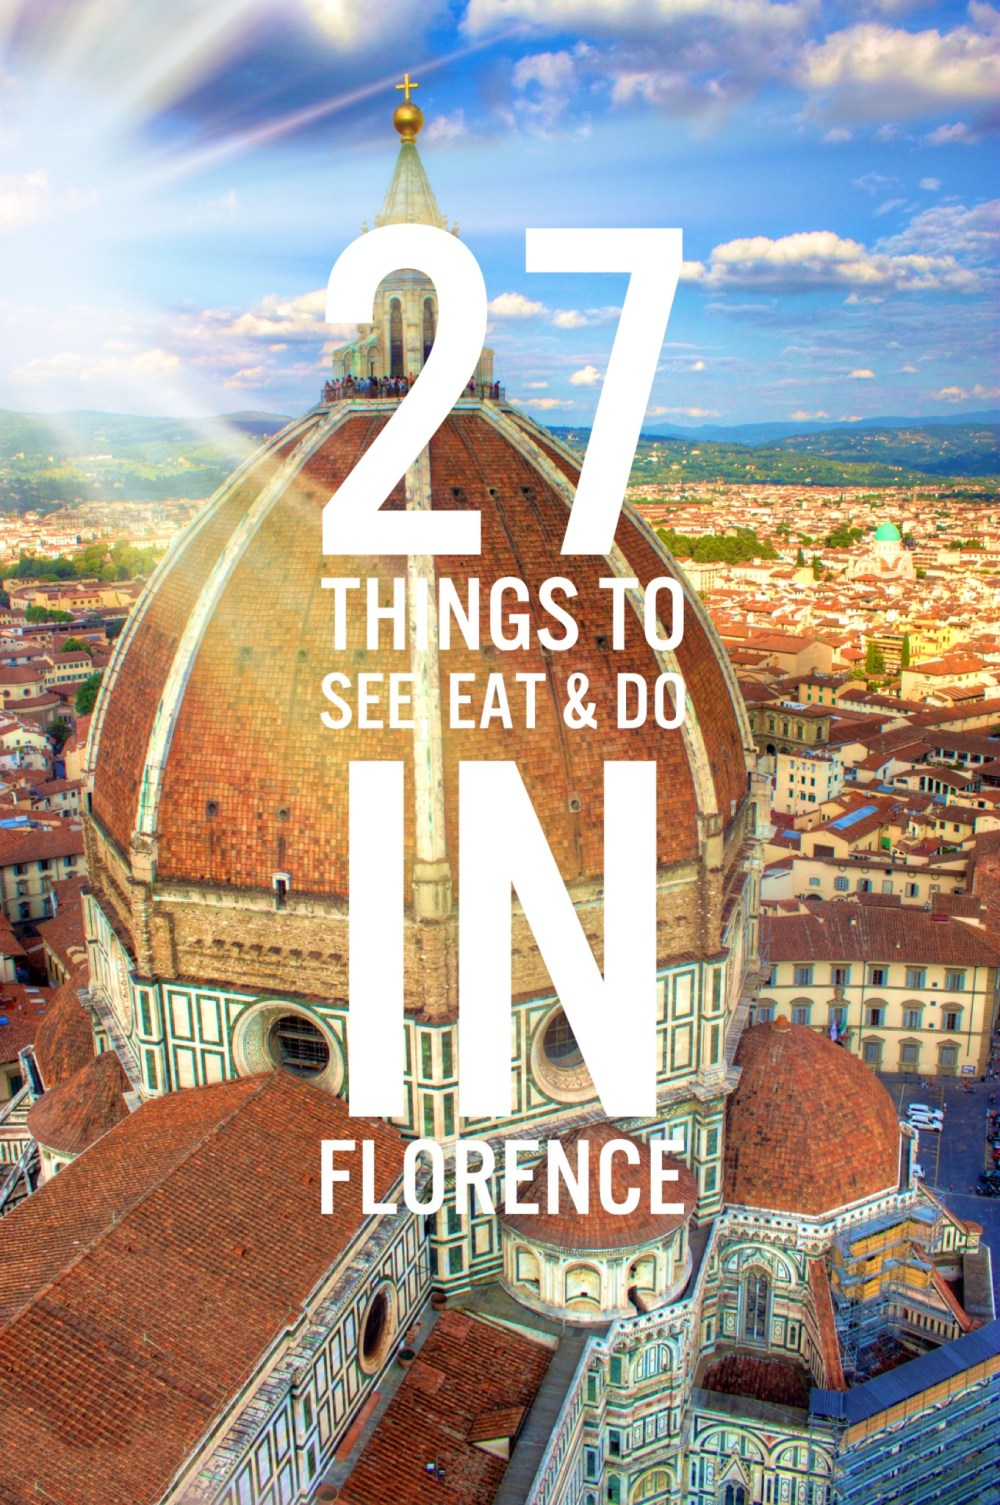 Florence city sun